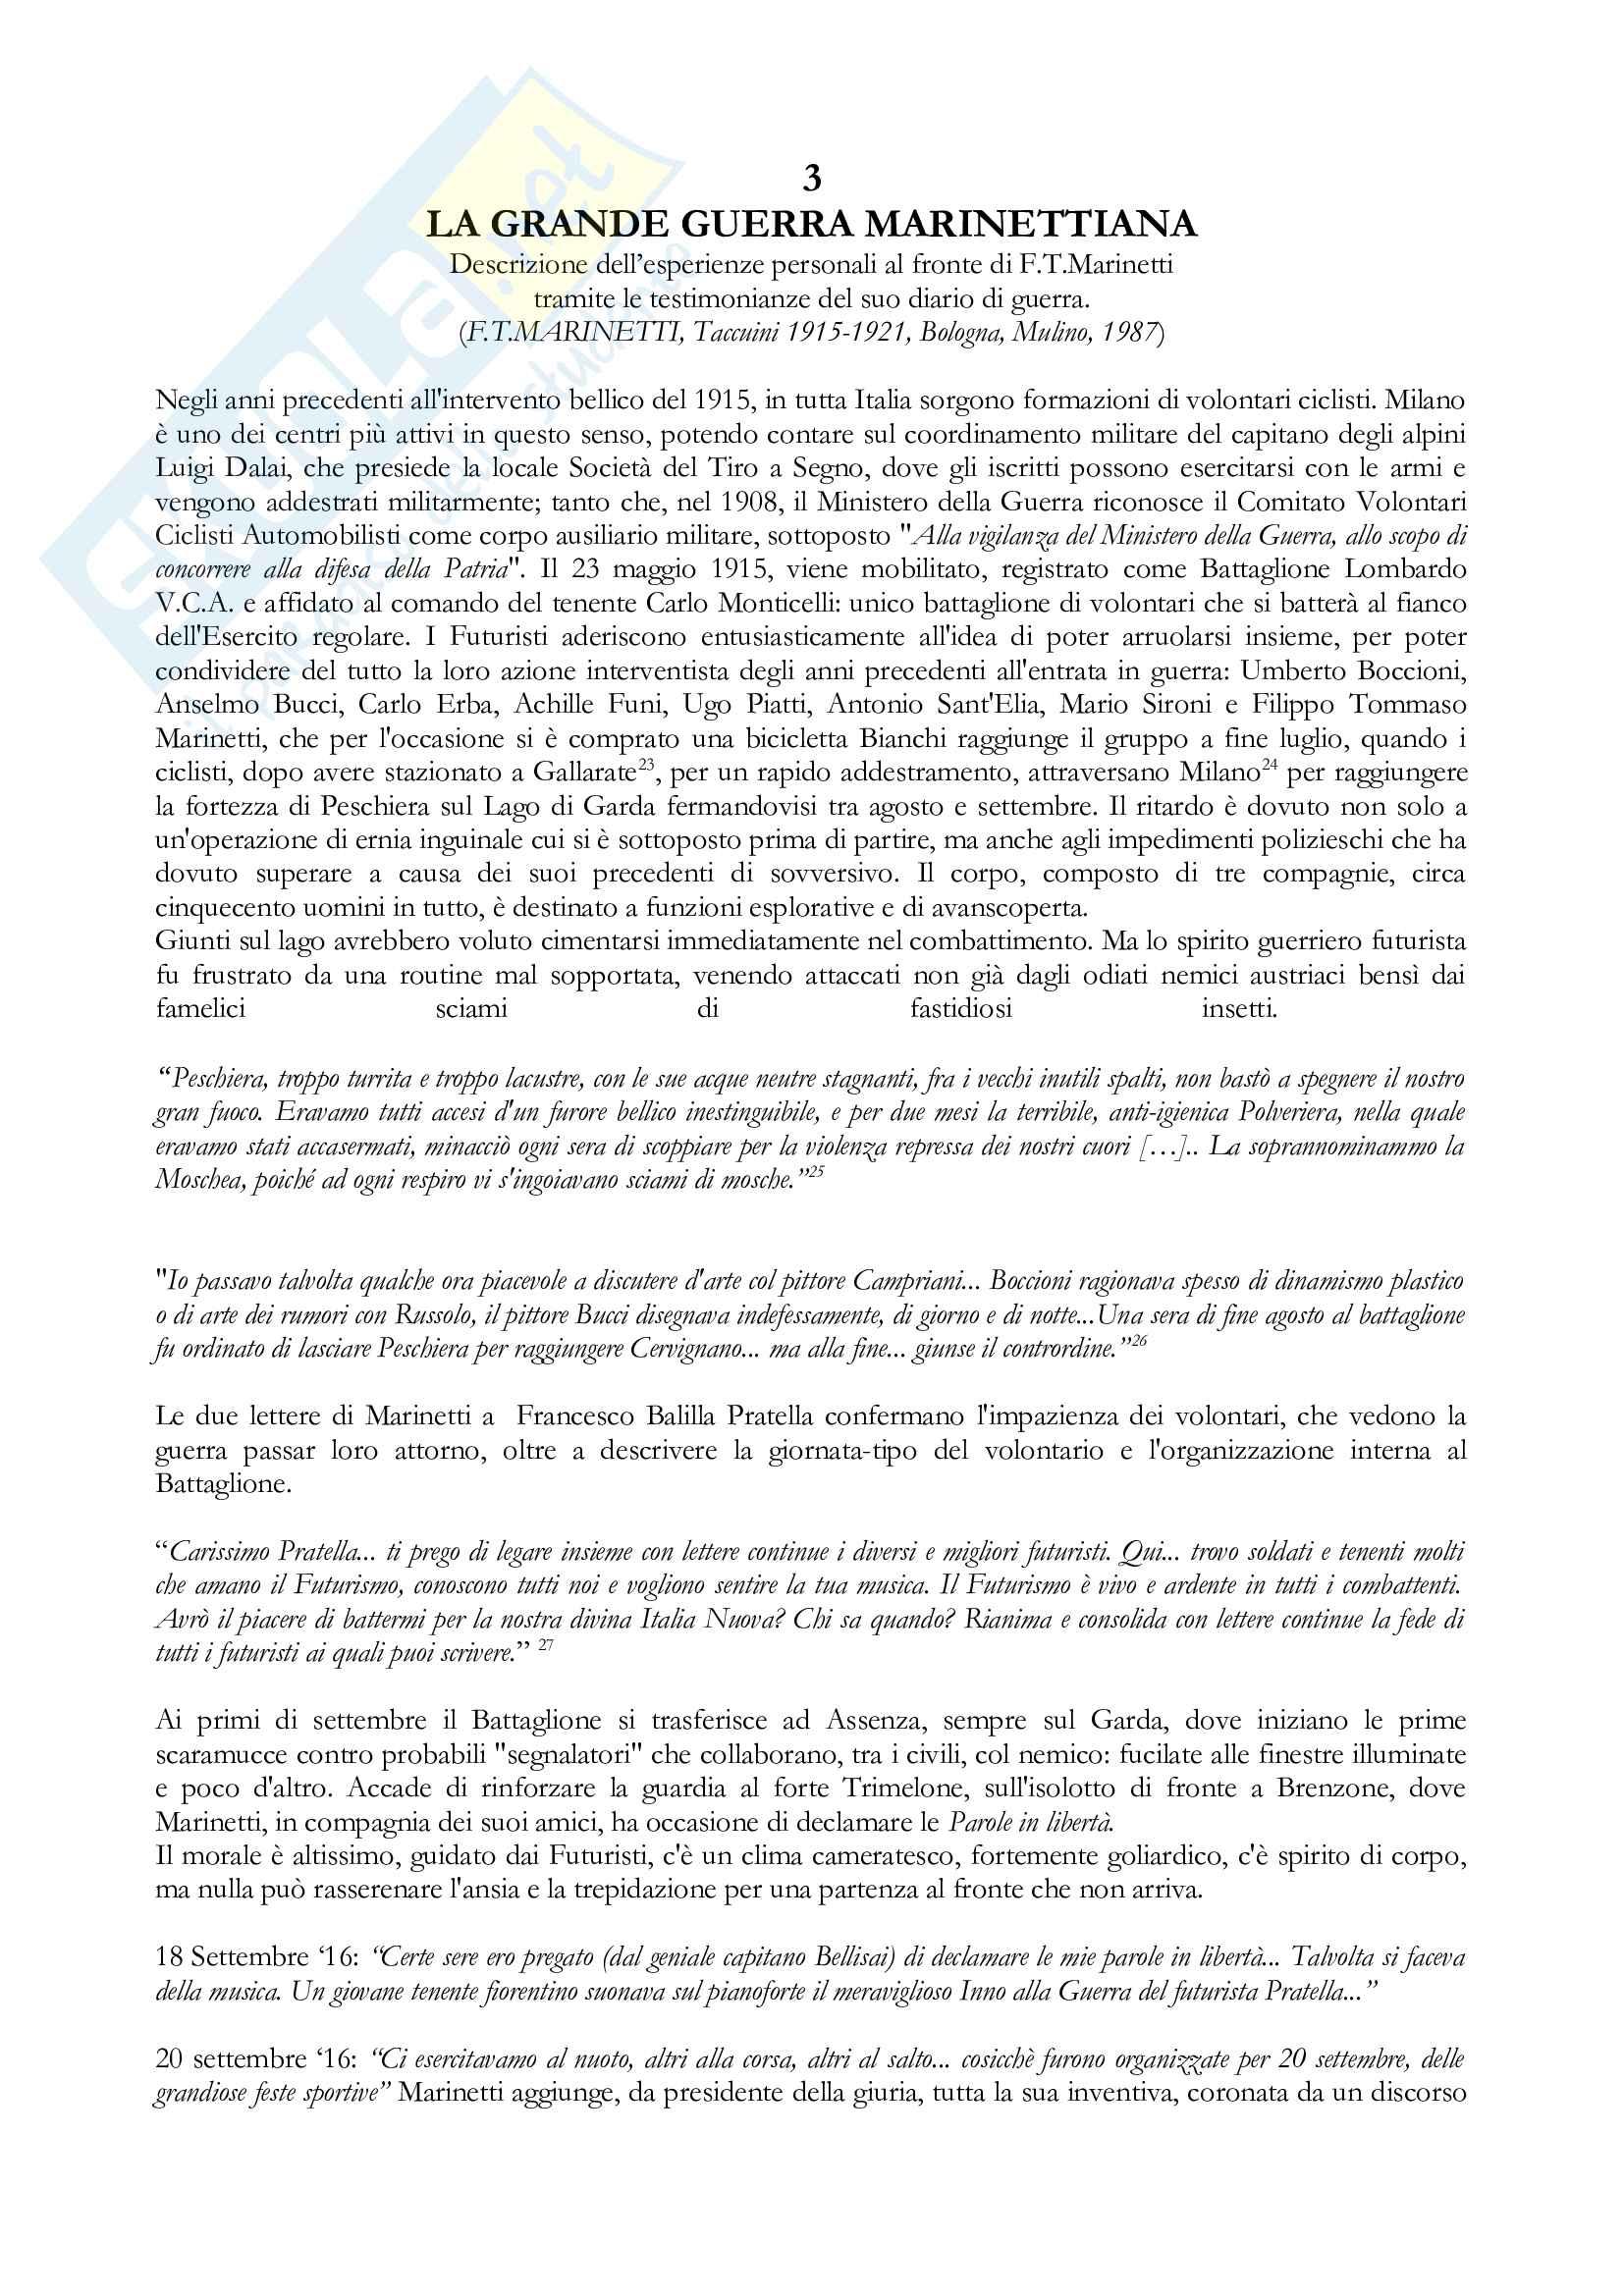 Tesi Futurismo e Filippo Tommaso Marinetti Pag. 16